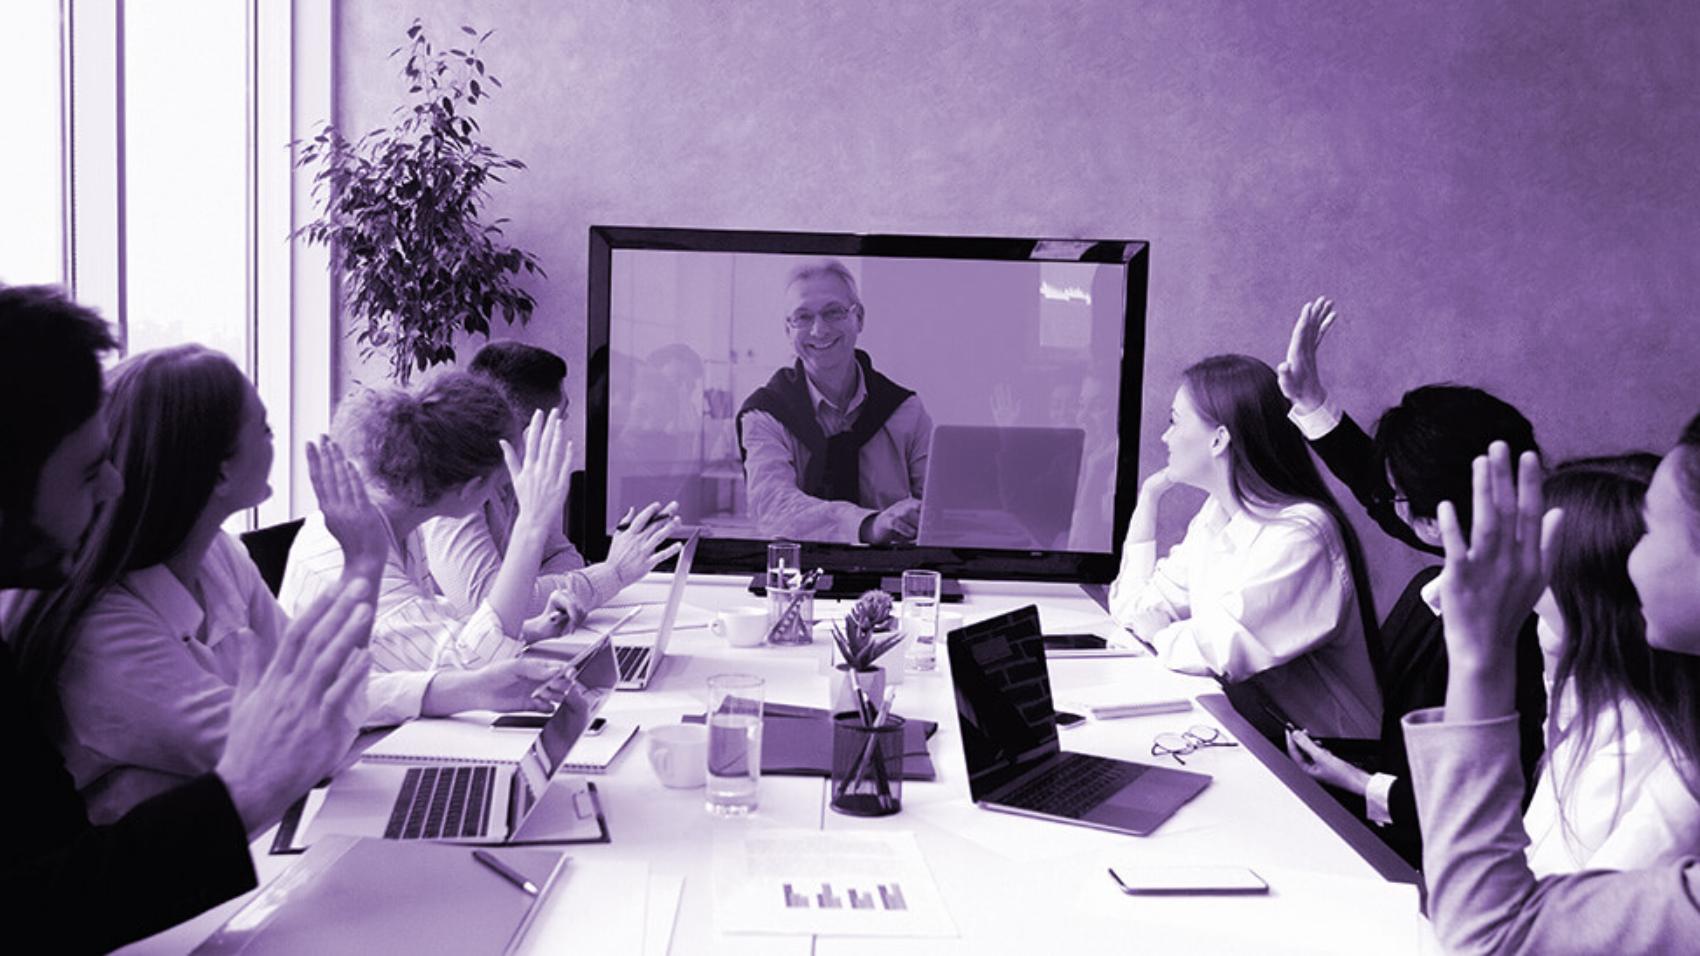 videokonferenz_MSTEAMS